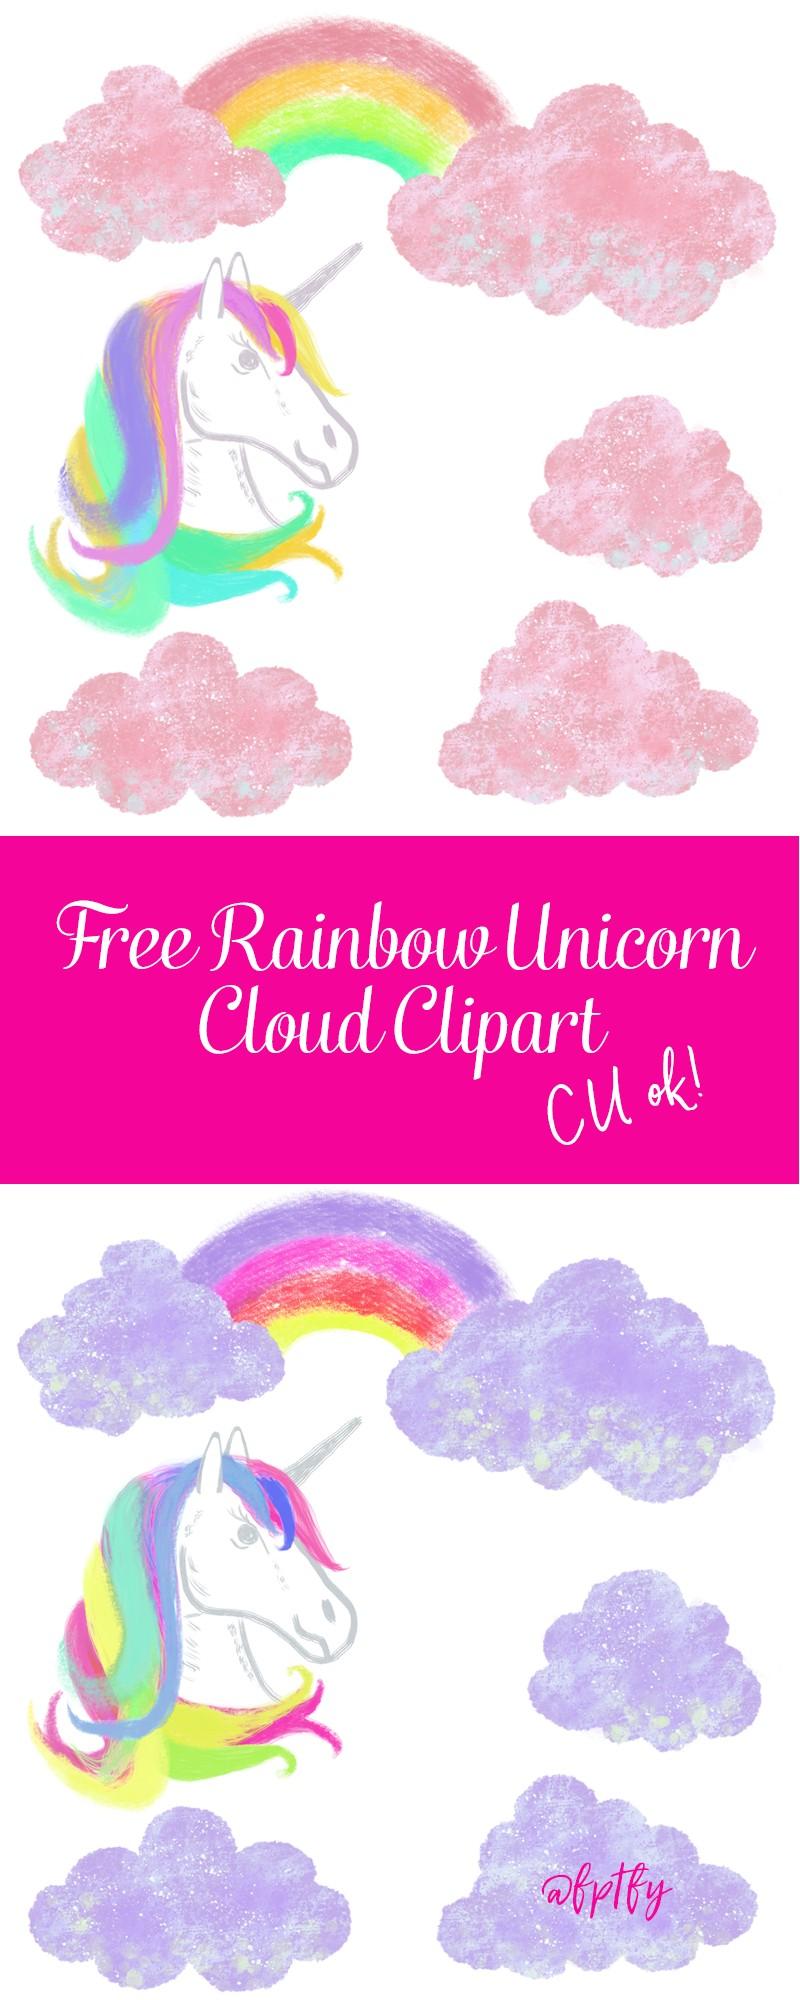 free-rainbow-unicorn-clouds-clipart